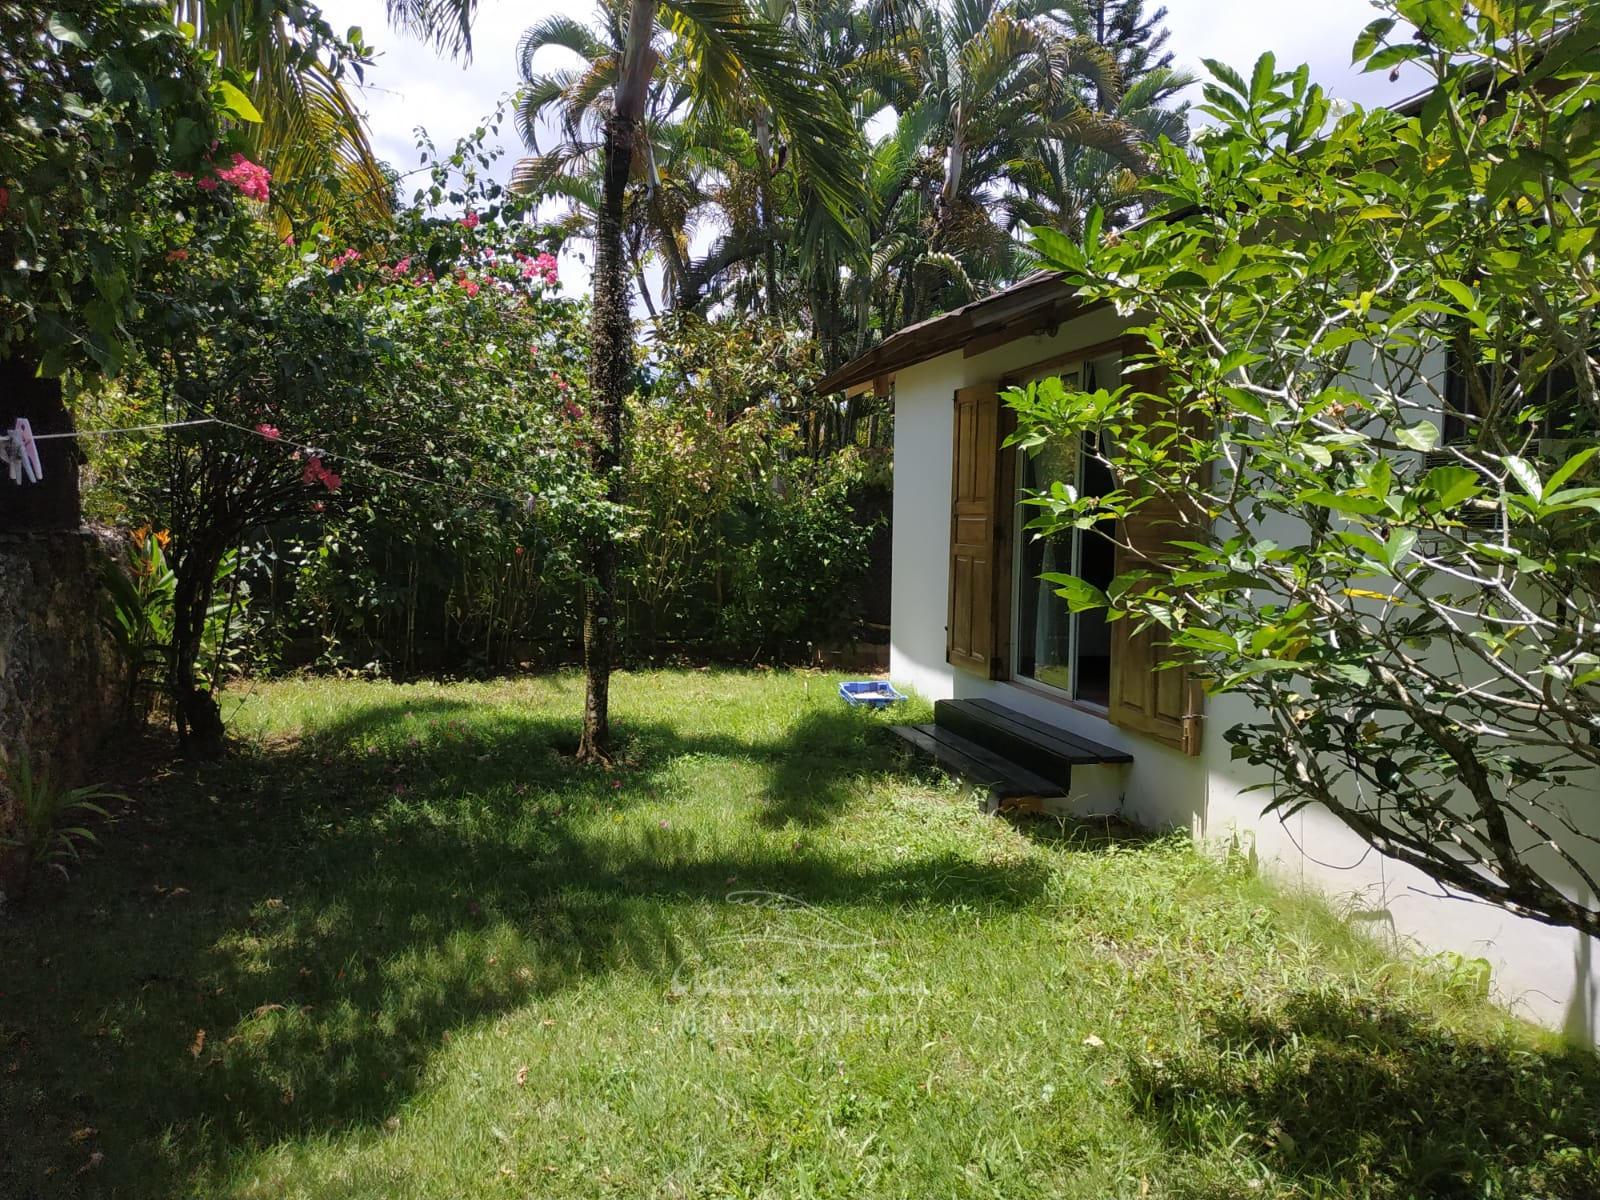 Villa Authentic Carribean Real Estate Las Terrenas Dominican Republic5.jpg